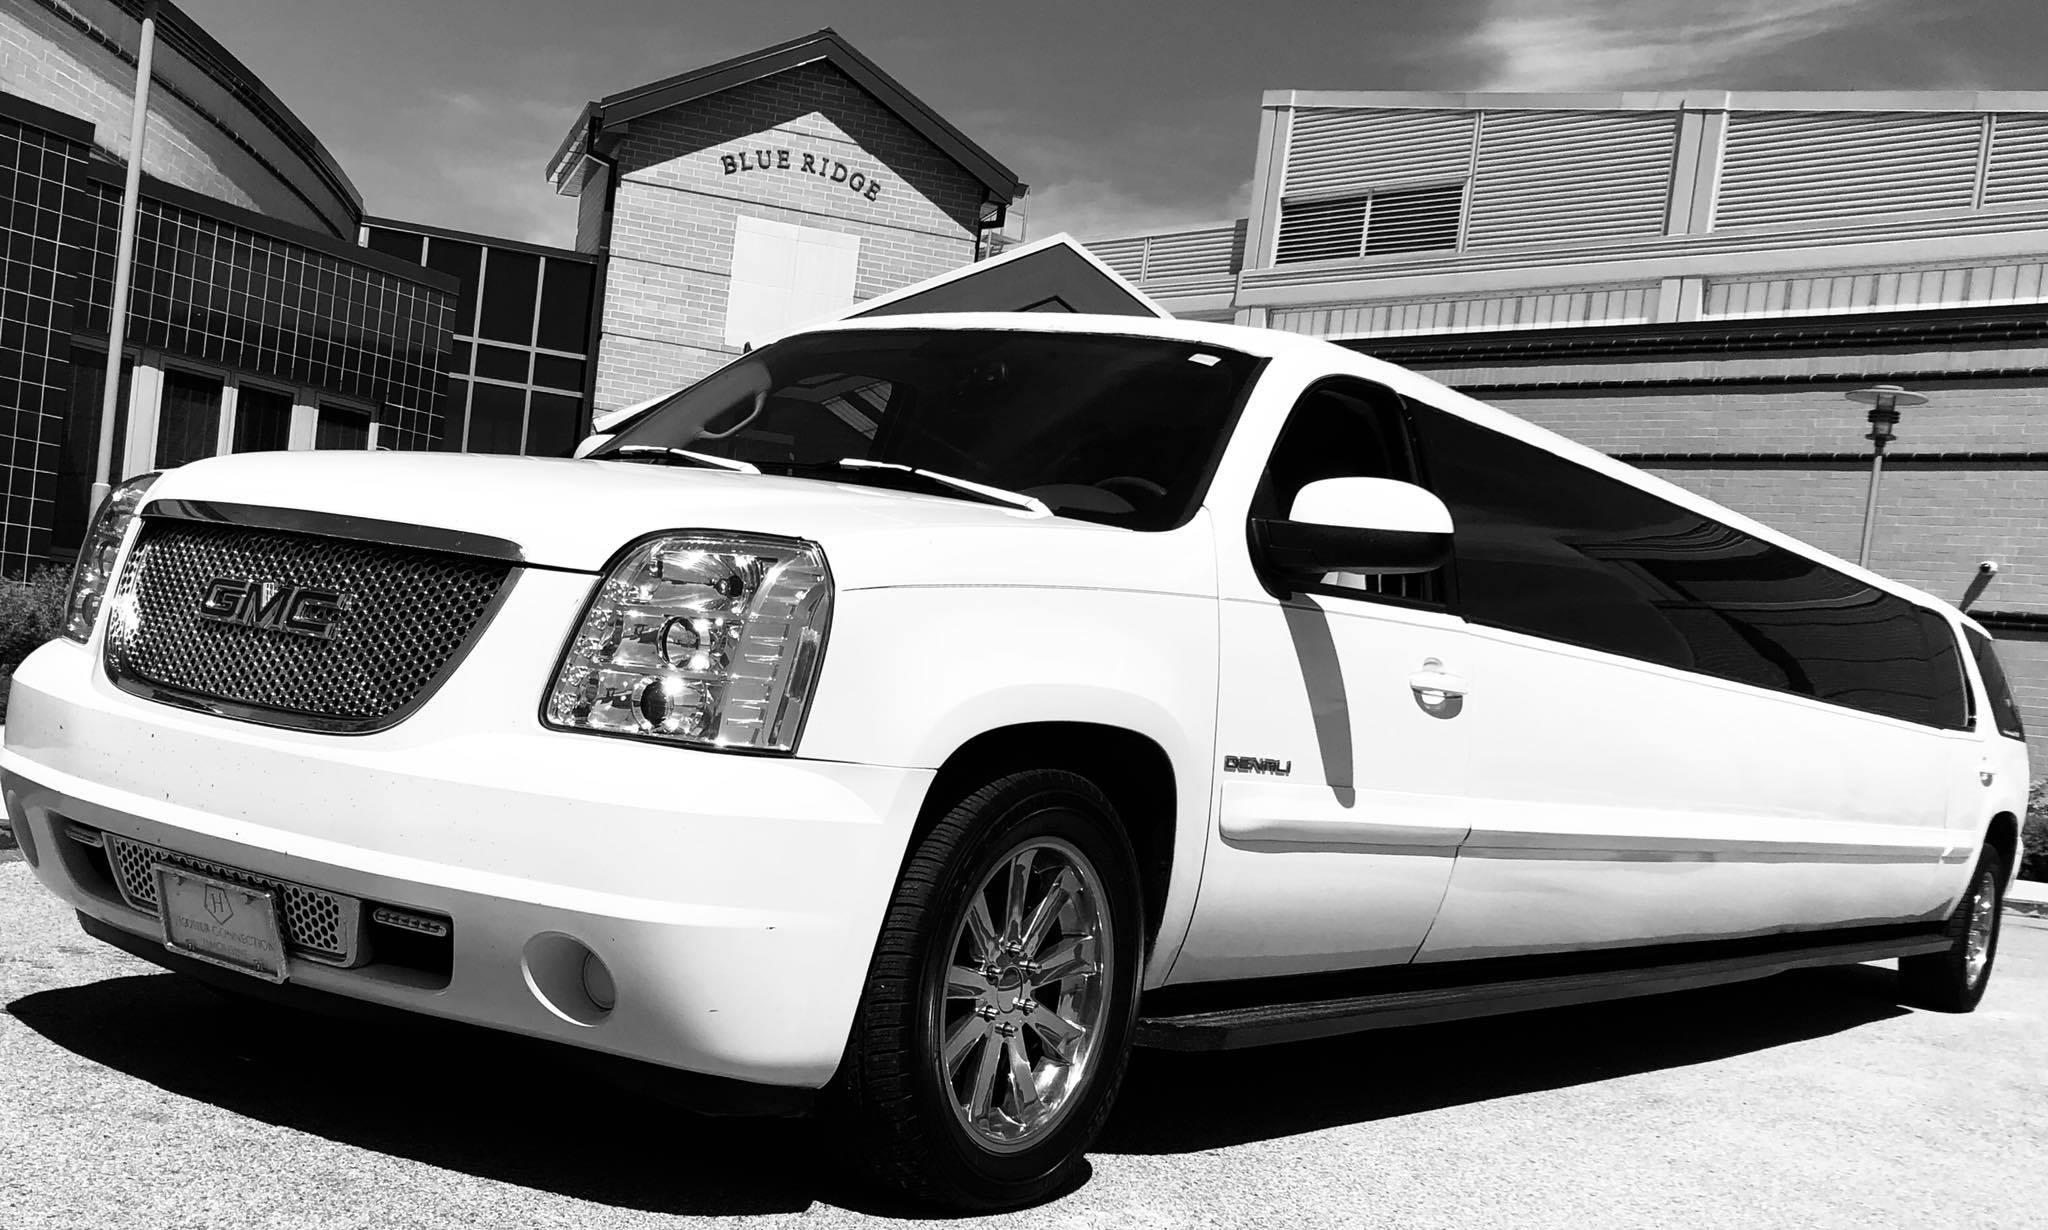 Indianapolis Limousine